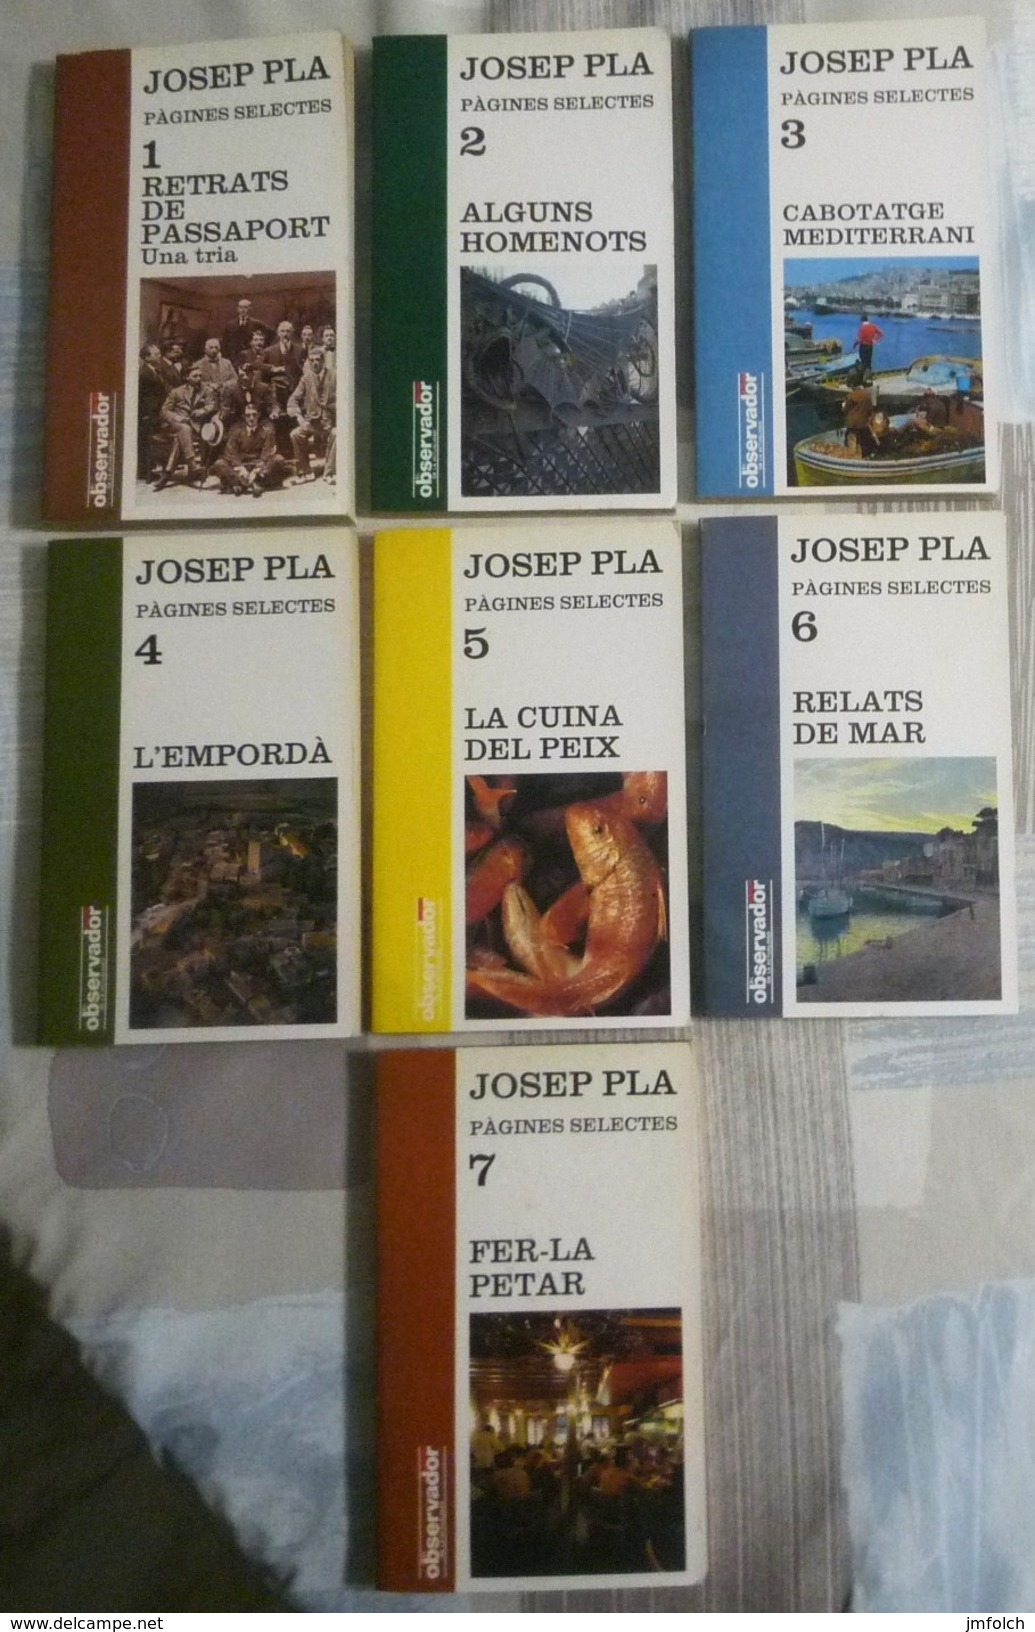 PÀGINES SELECTES. JOSEP PLA.  COLECCION DE SIETE LIBROS EN LENGUA CATALANA - Novelas